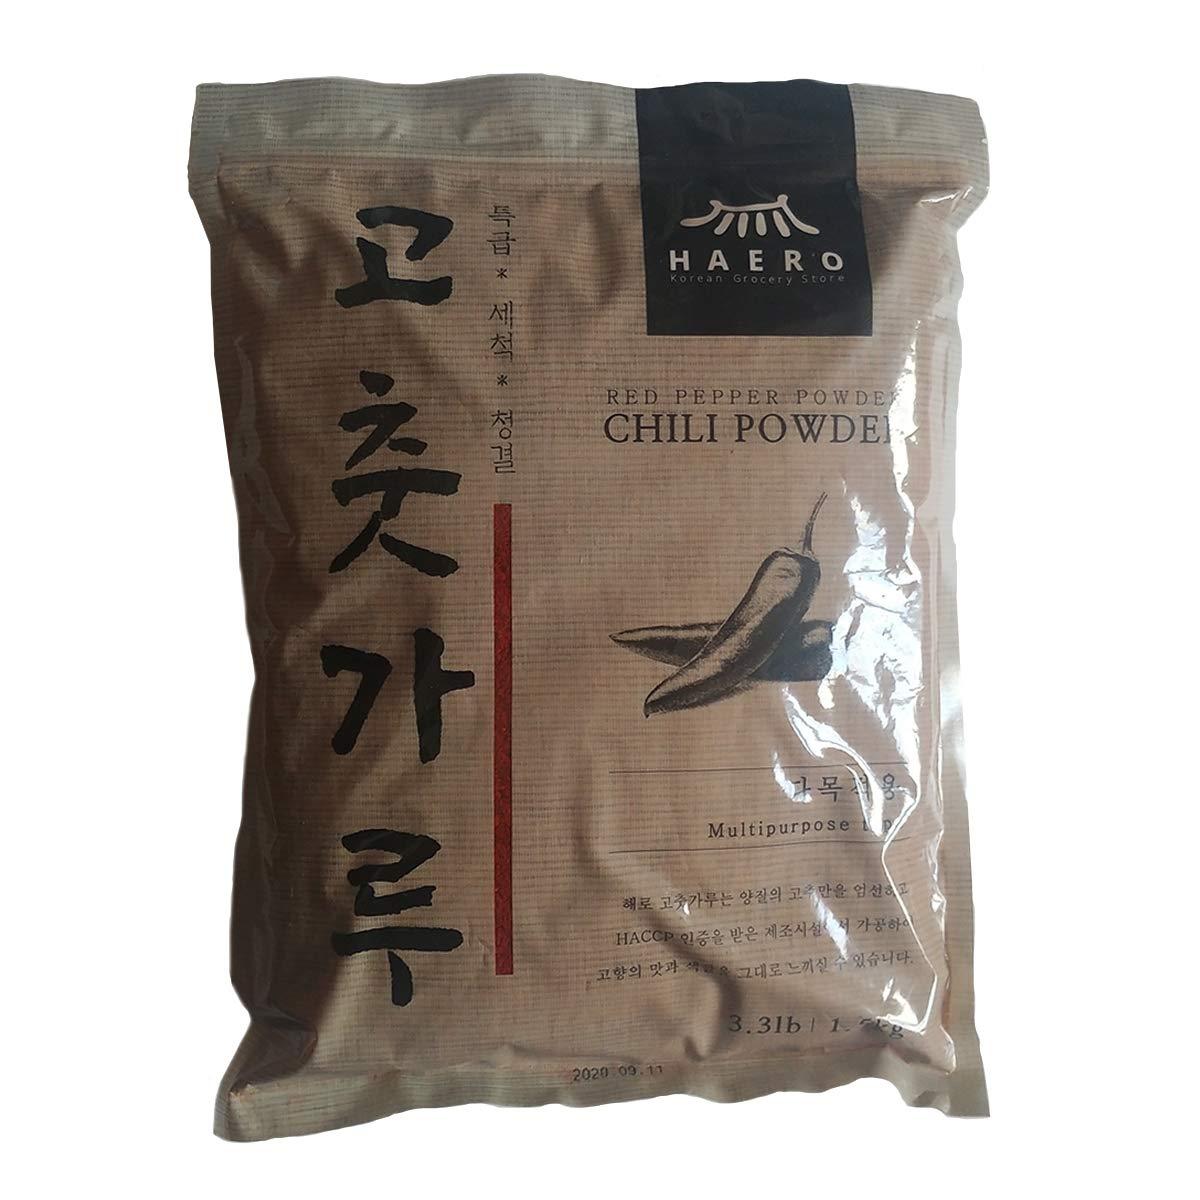 [HAERO] Red Chili Pepper Flakes Powder Gochugaru / 3.3LB (1.5kg) / 100% red pepper / Best for Korean cuisine such as kimchi, gochujang, tteokbokki, Korean Chicken Sauce, etc.